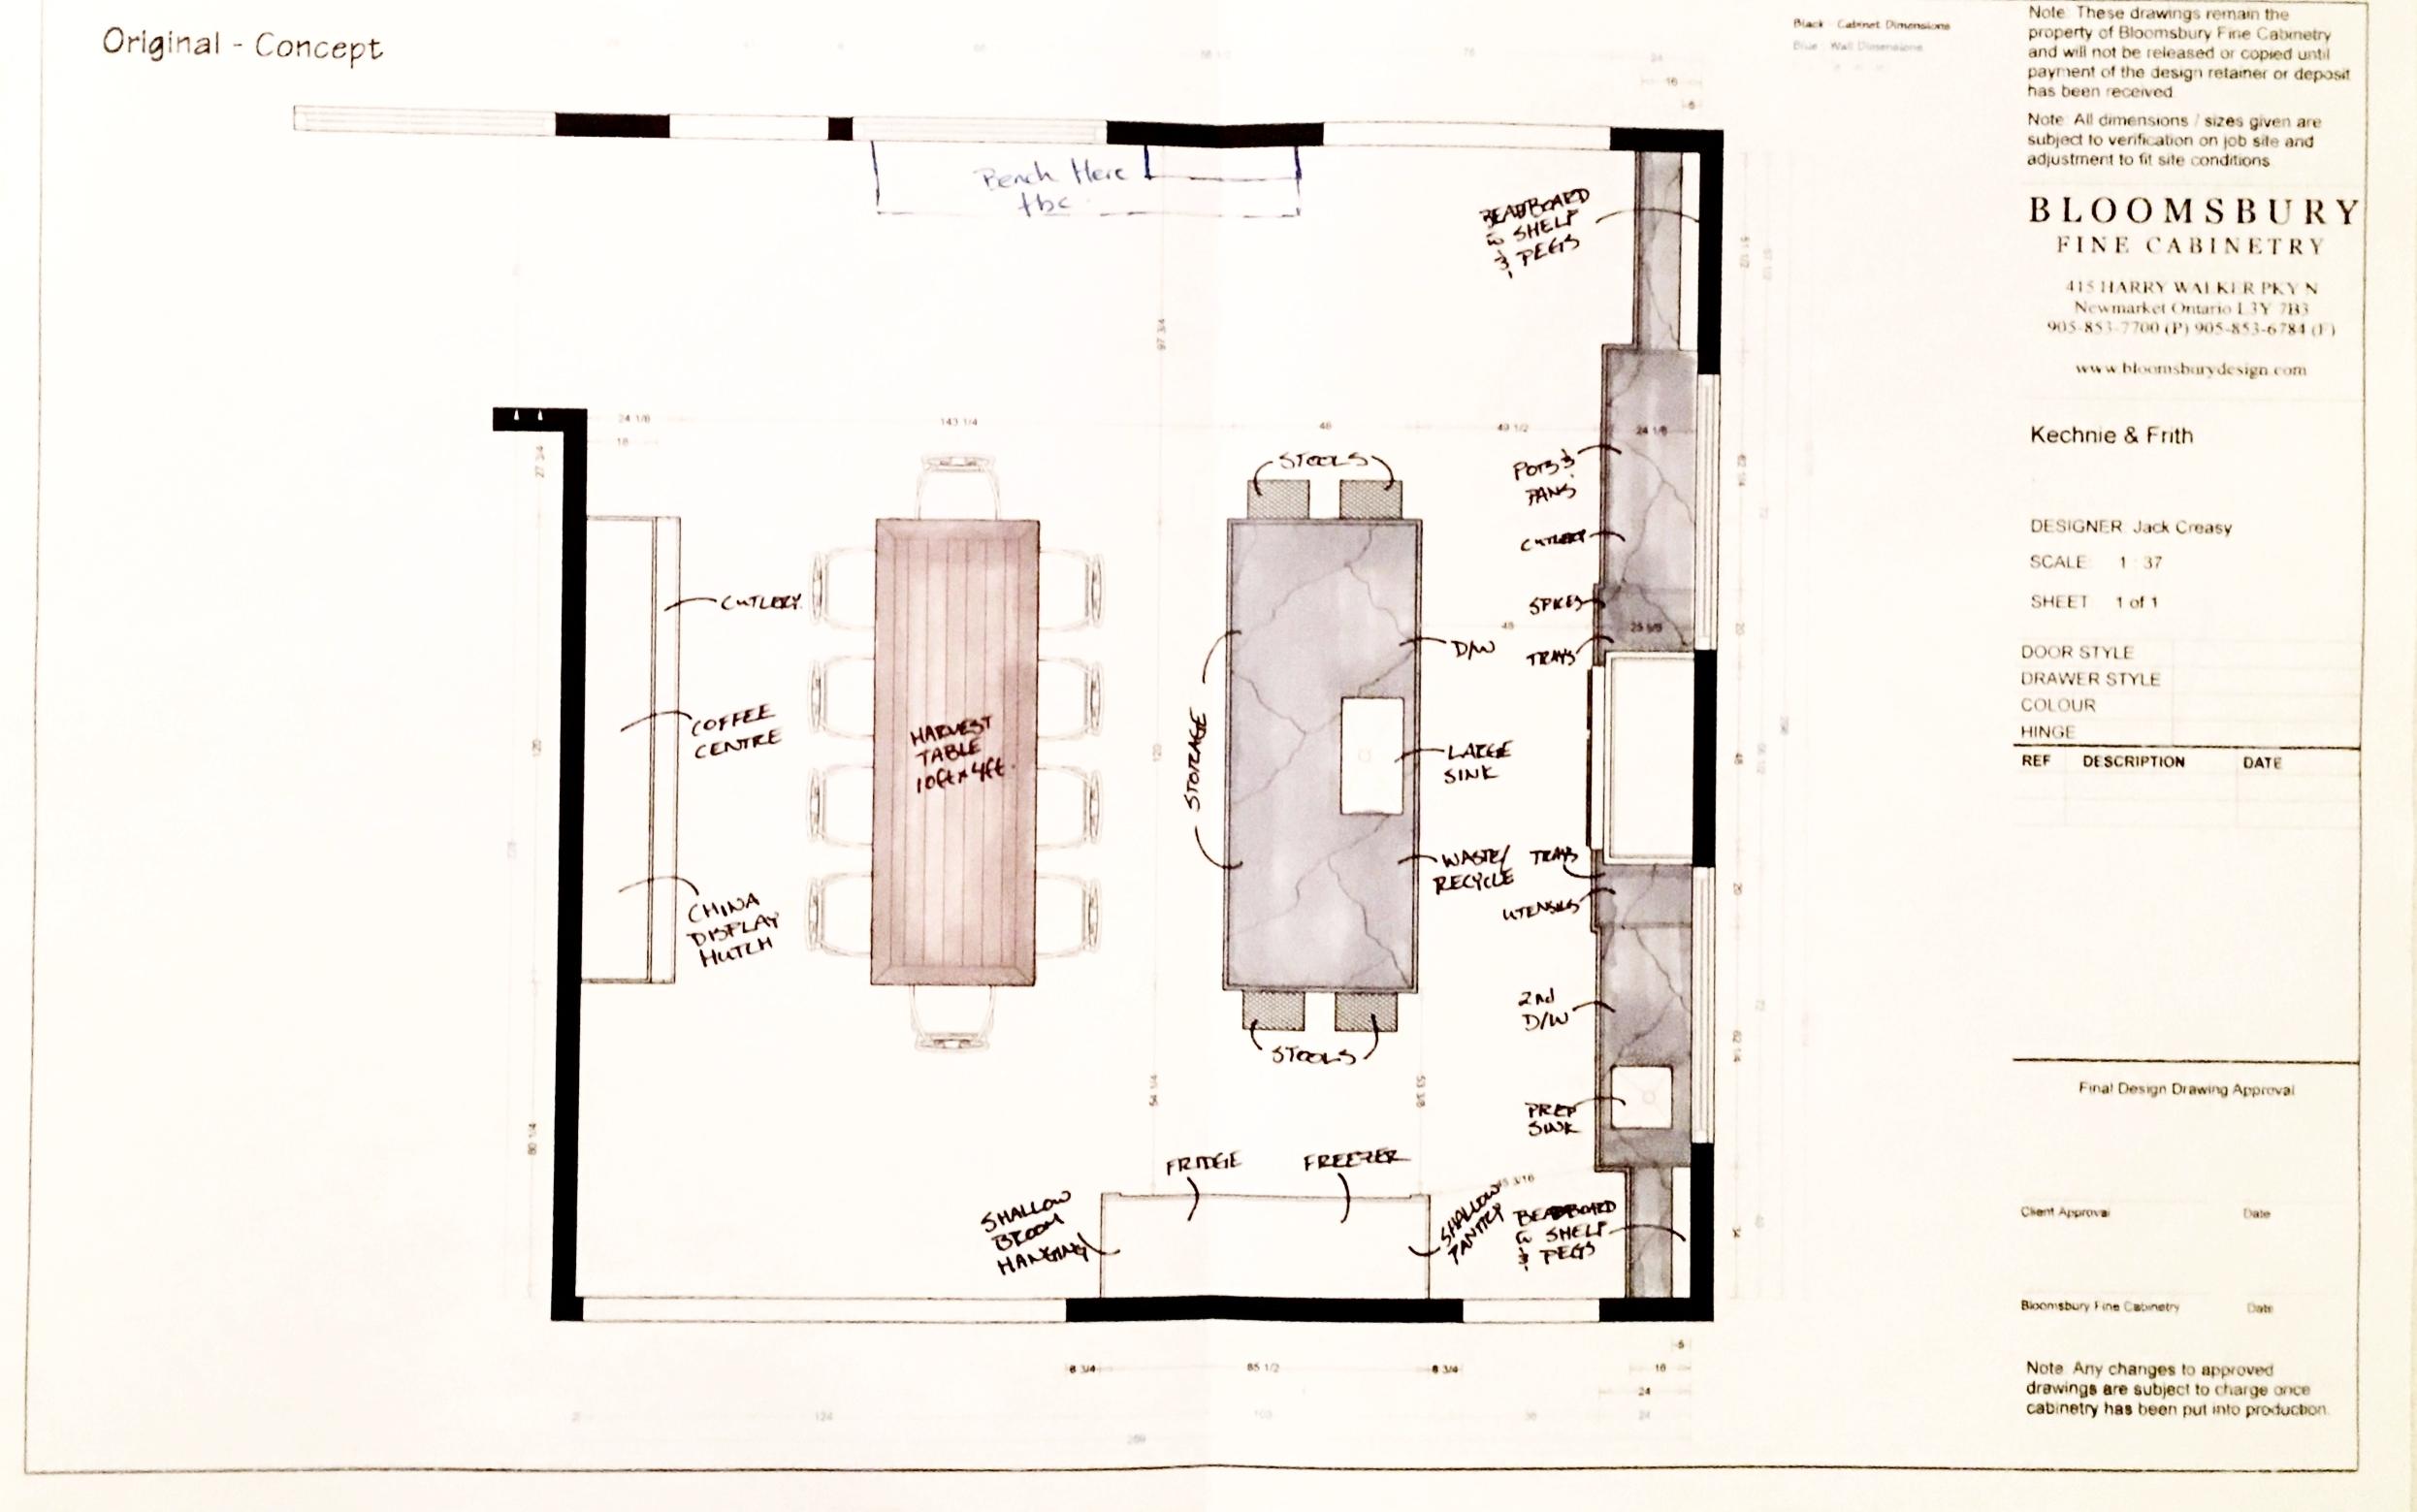 First Draft Floor Plans - Feb 13:18.jpg